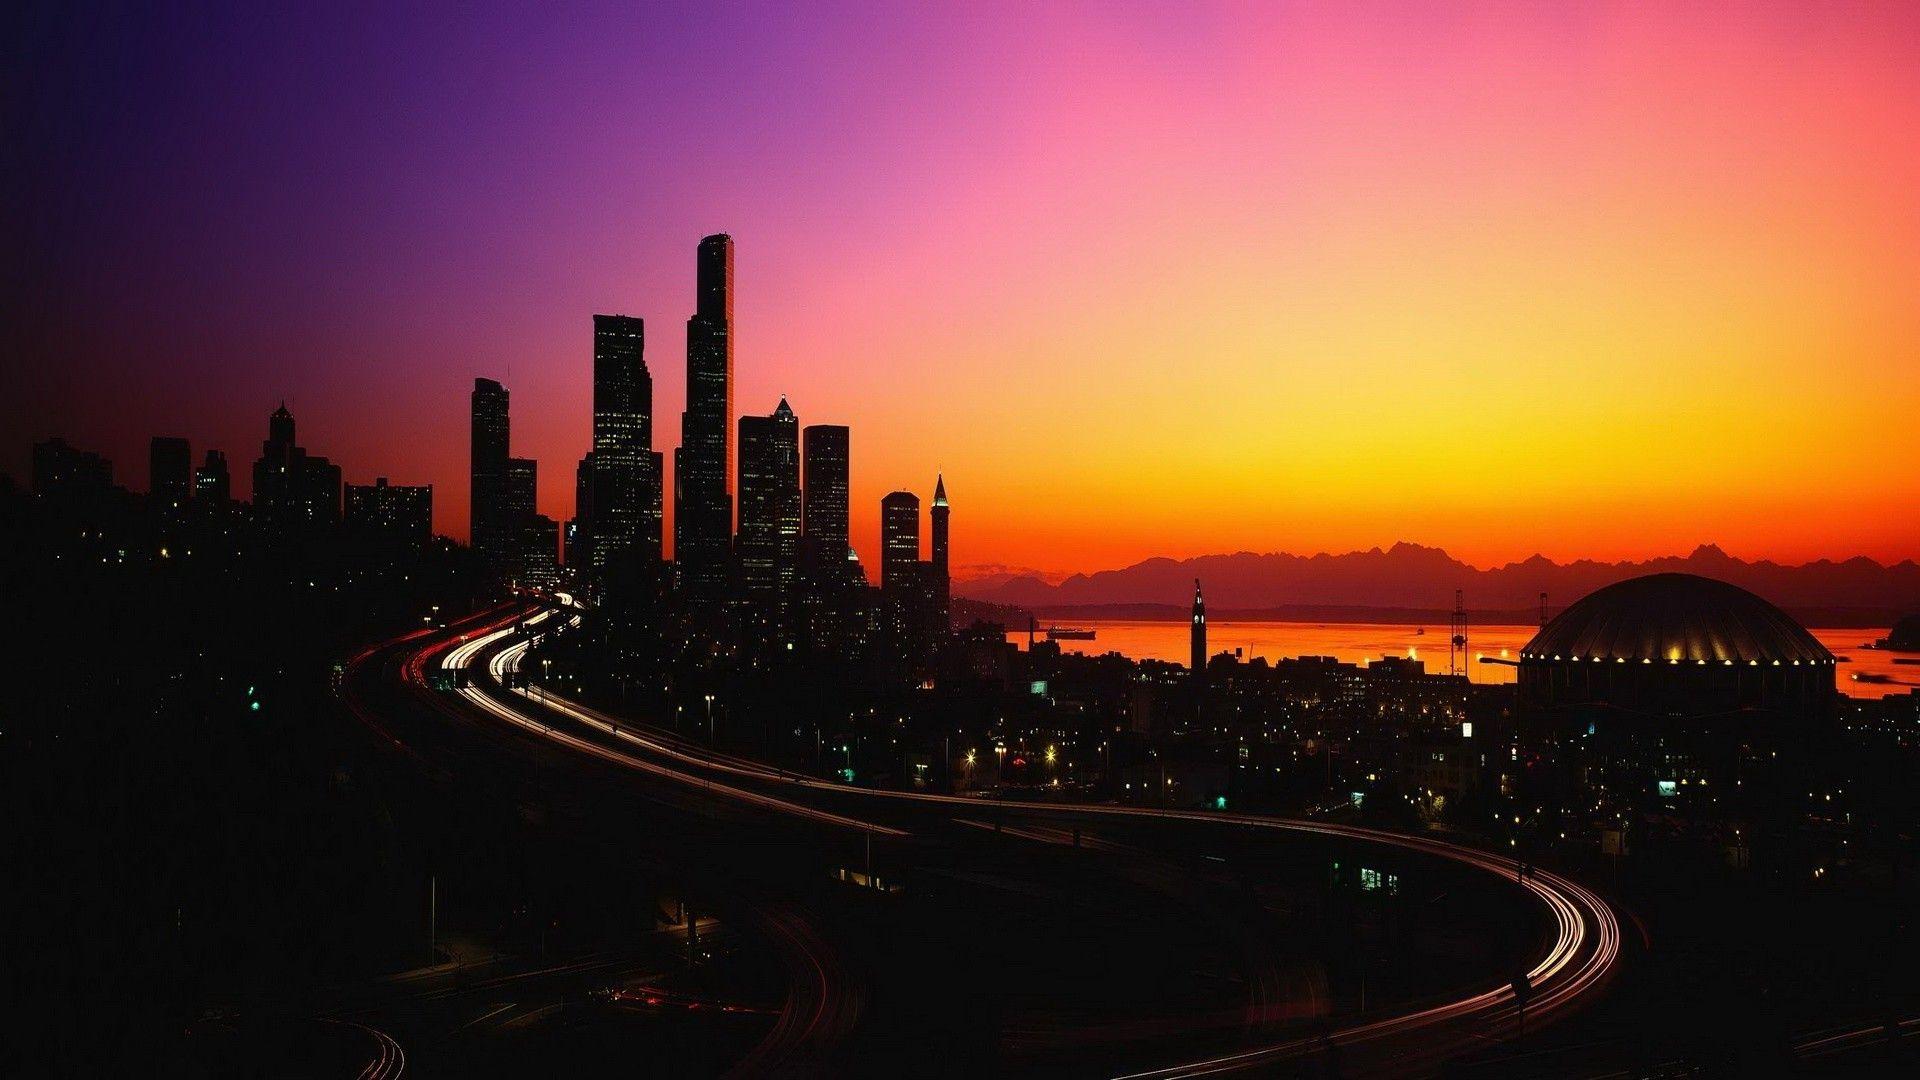 City lights in the dusk wallpaper,World Wallpaper,Light Wallpaper, Dusk 1920x1080 HD ...